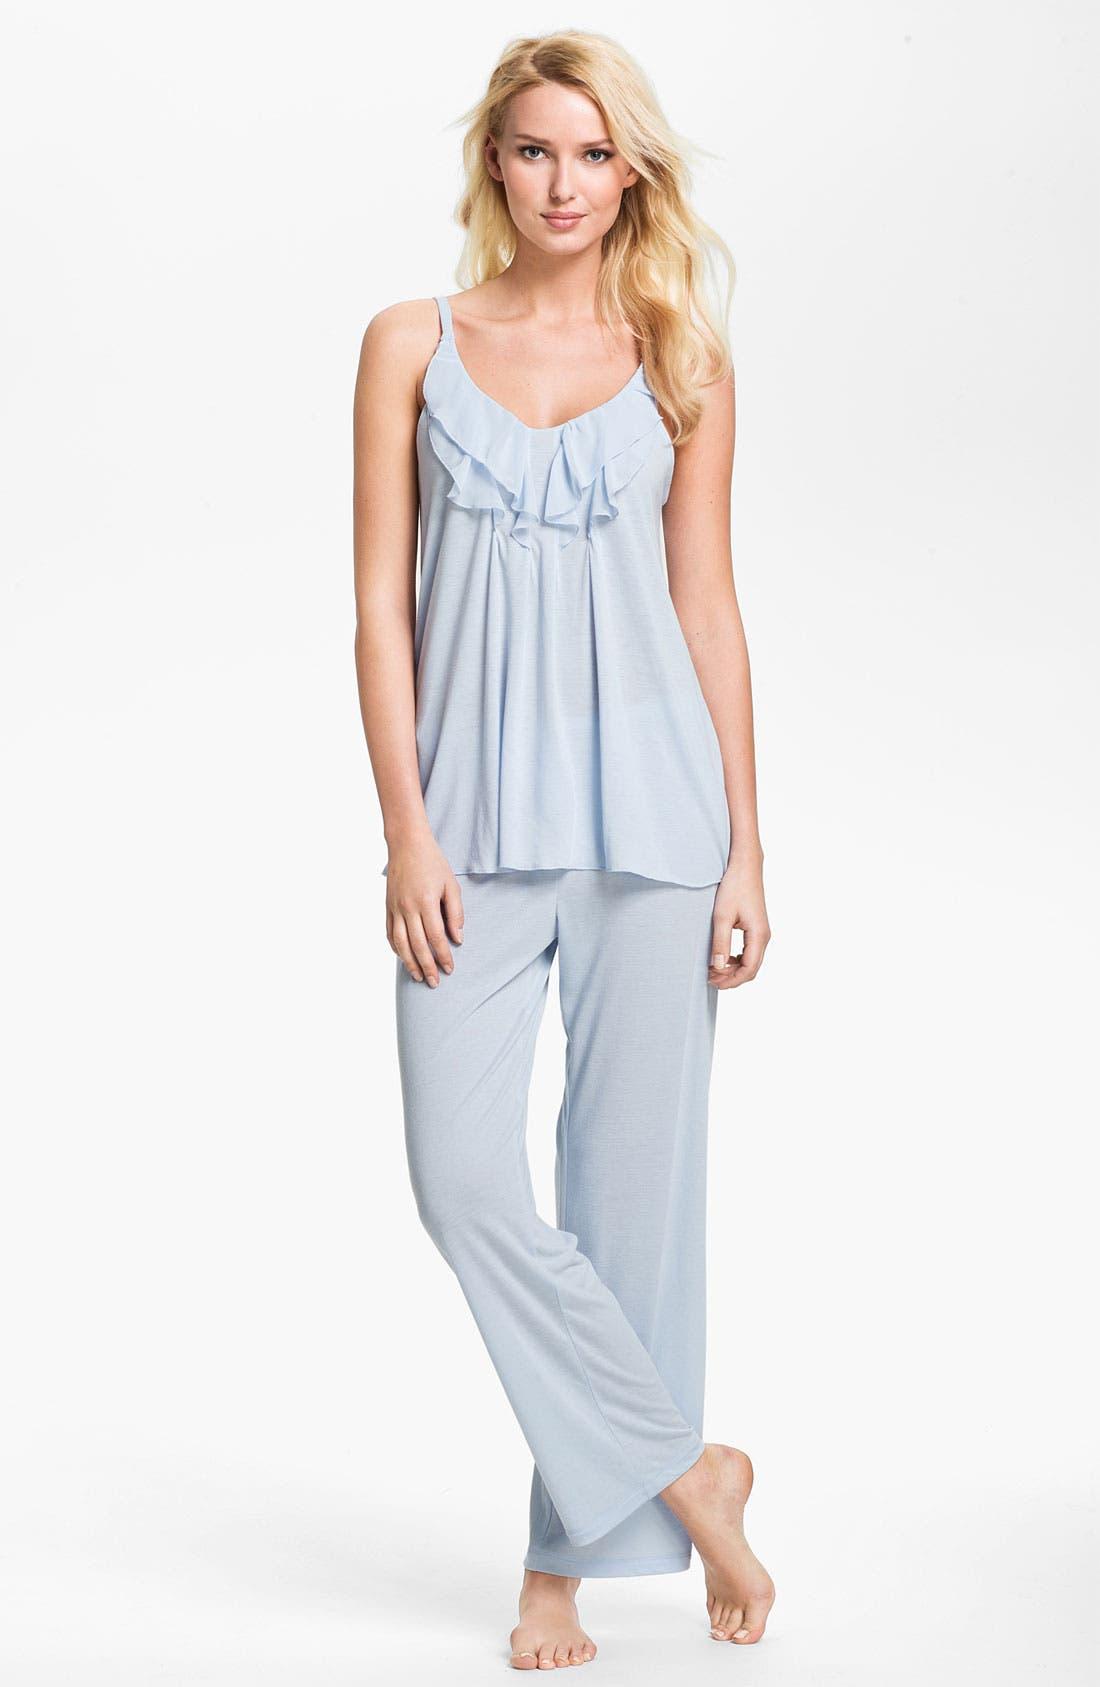 Alternate Image 1 Selected - Oscar de la Renta Sleepwear 'Animal Blossom' Pajamas